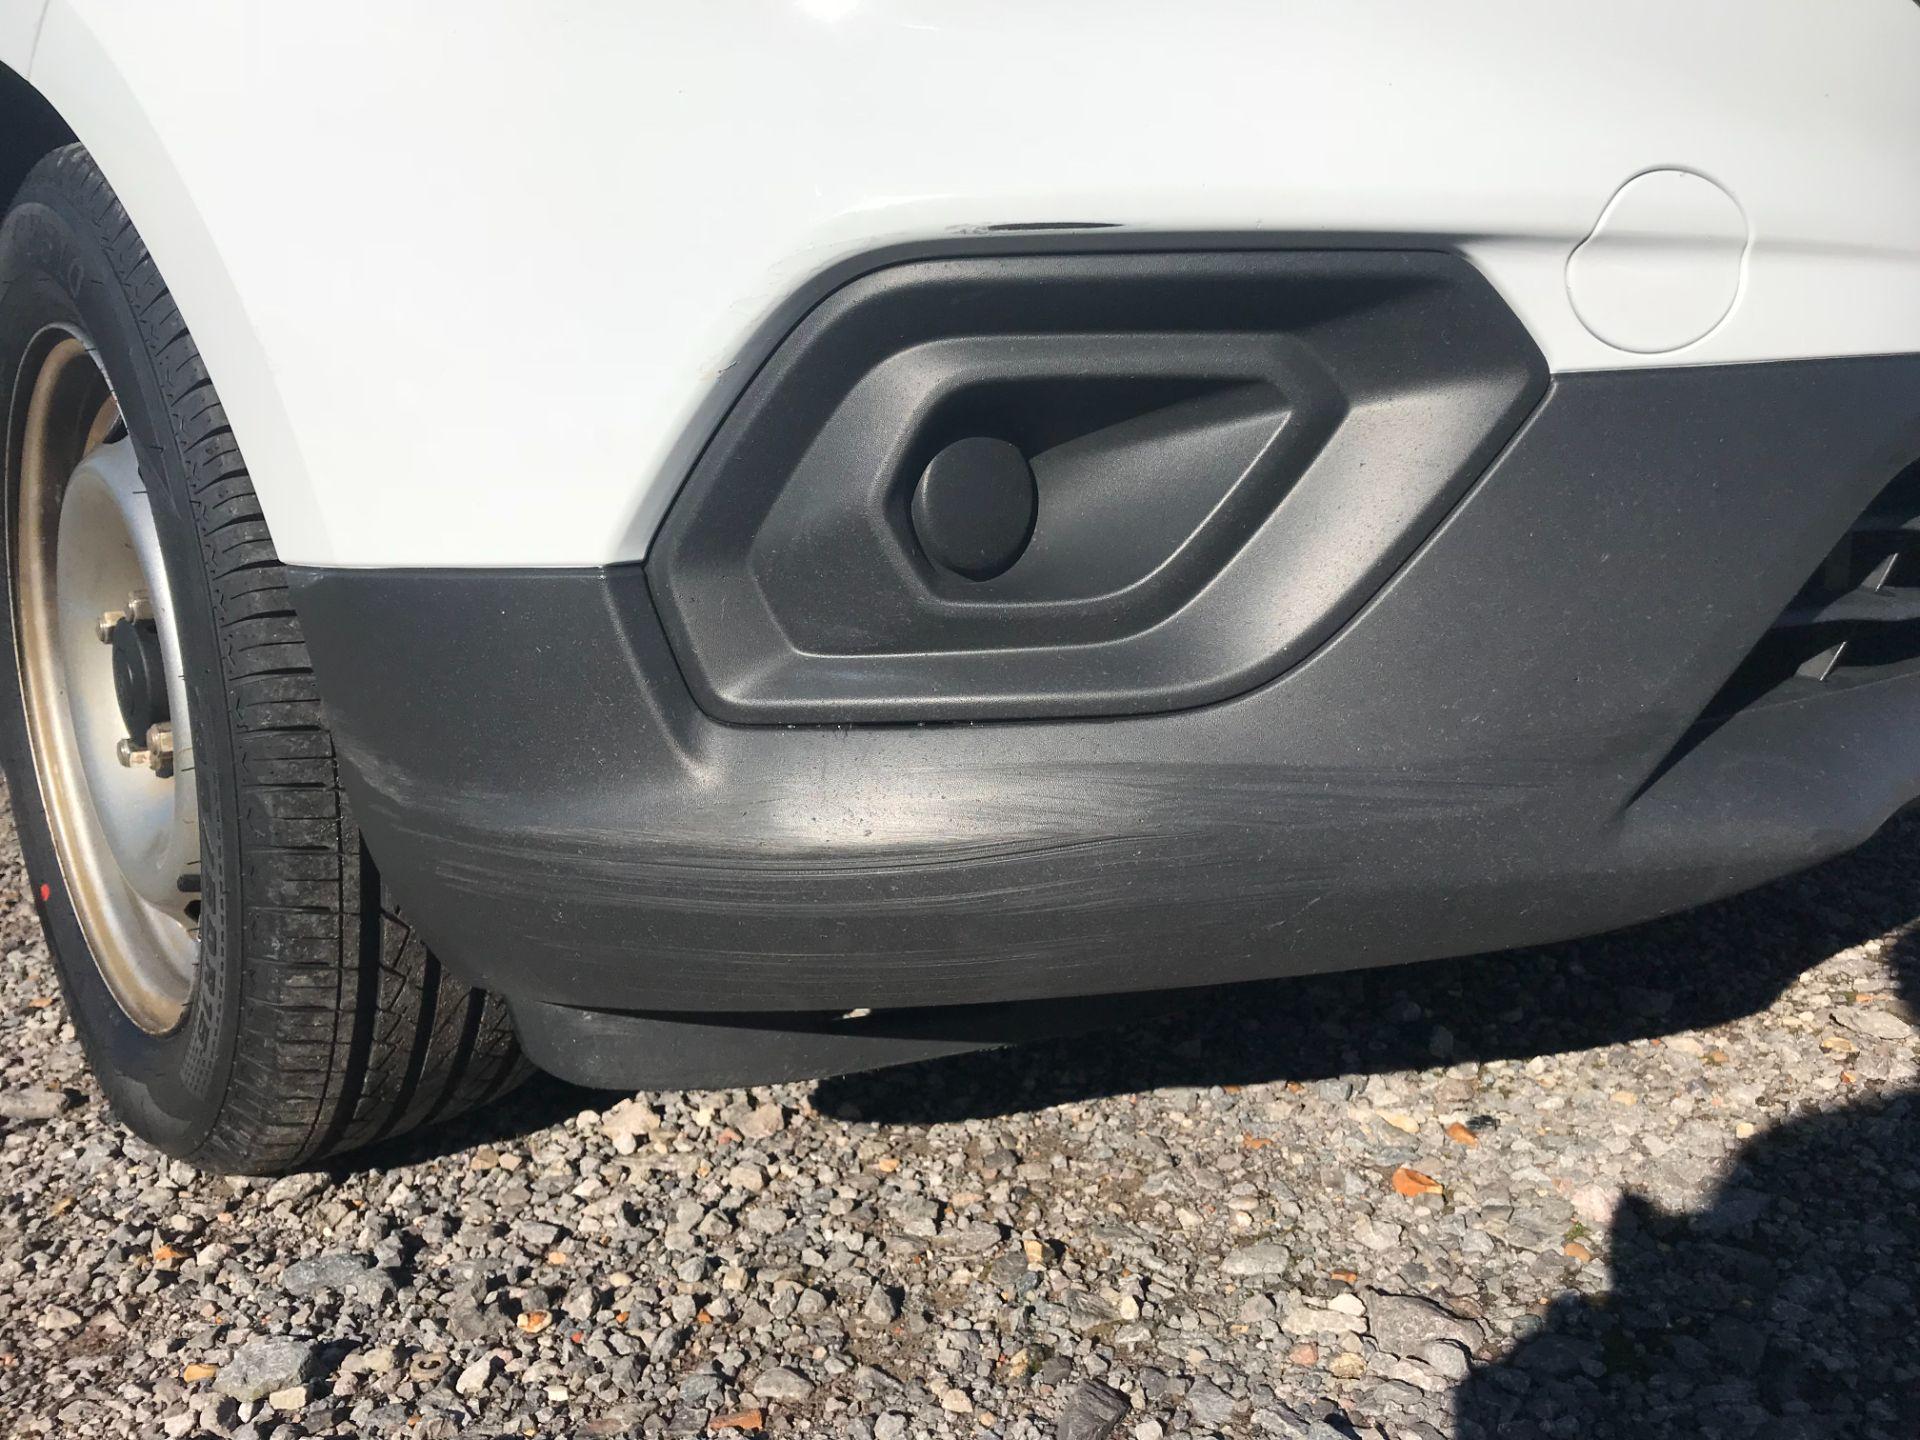 2019 Ford Transit Courier 1.5 Tdci Van Euro 6 (BL69RJZ) Image 35